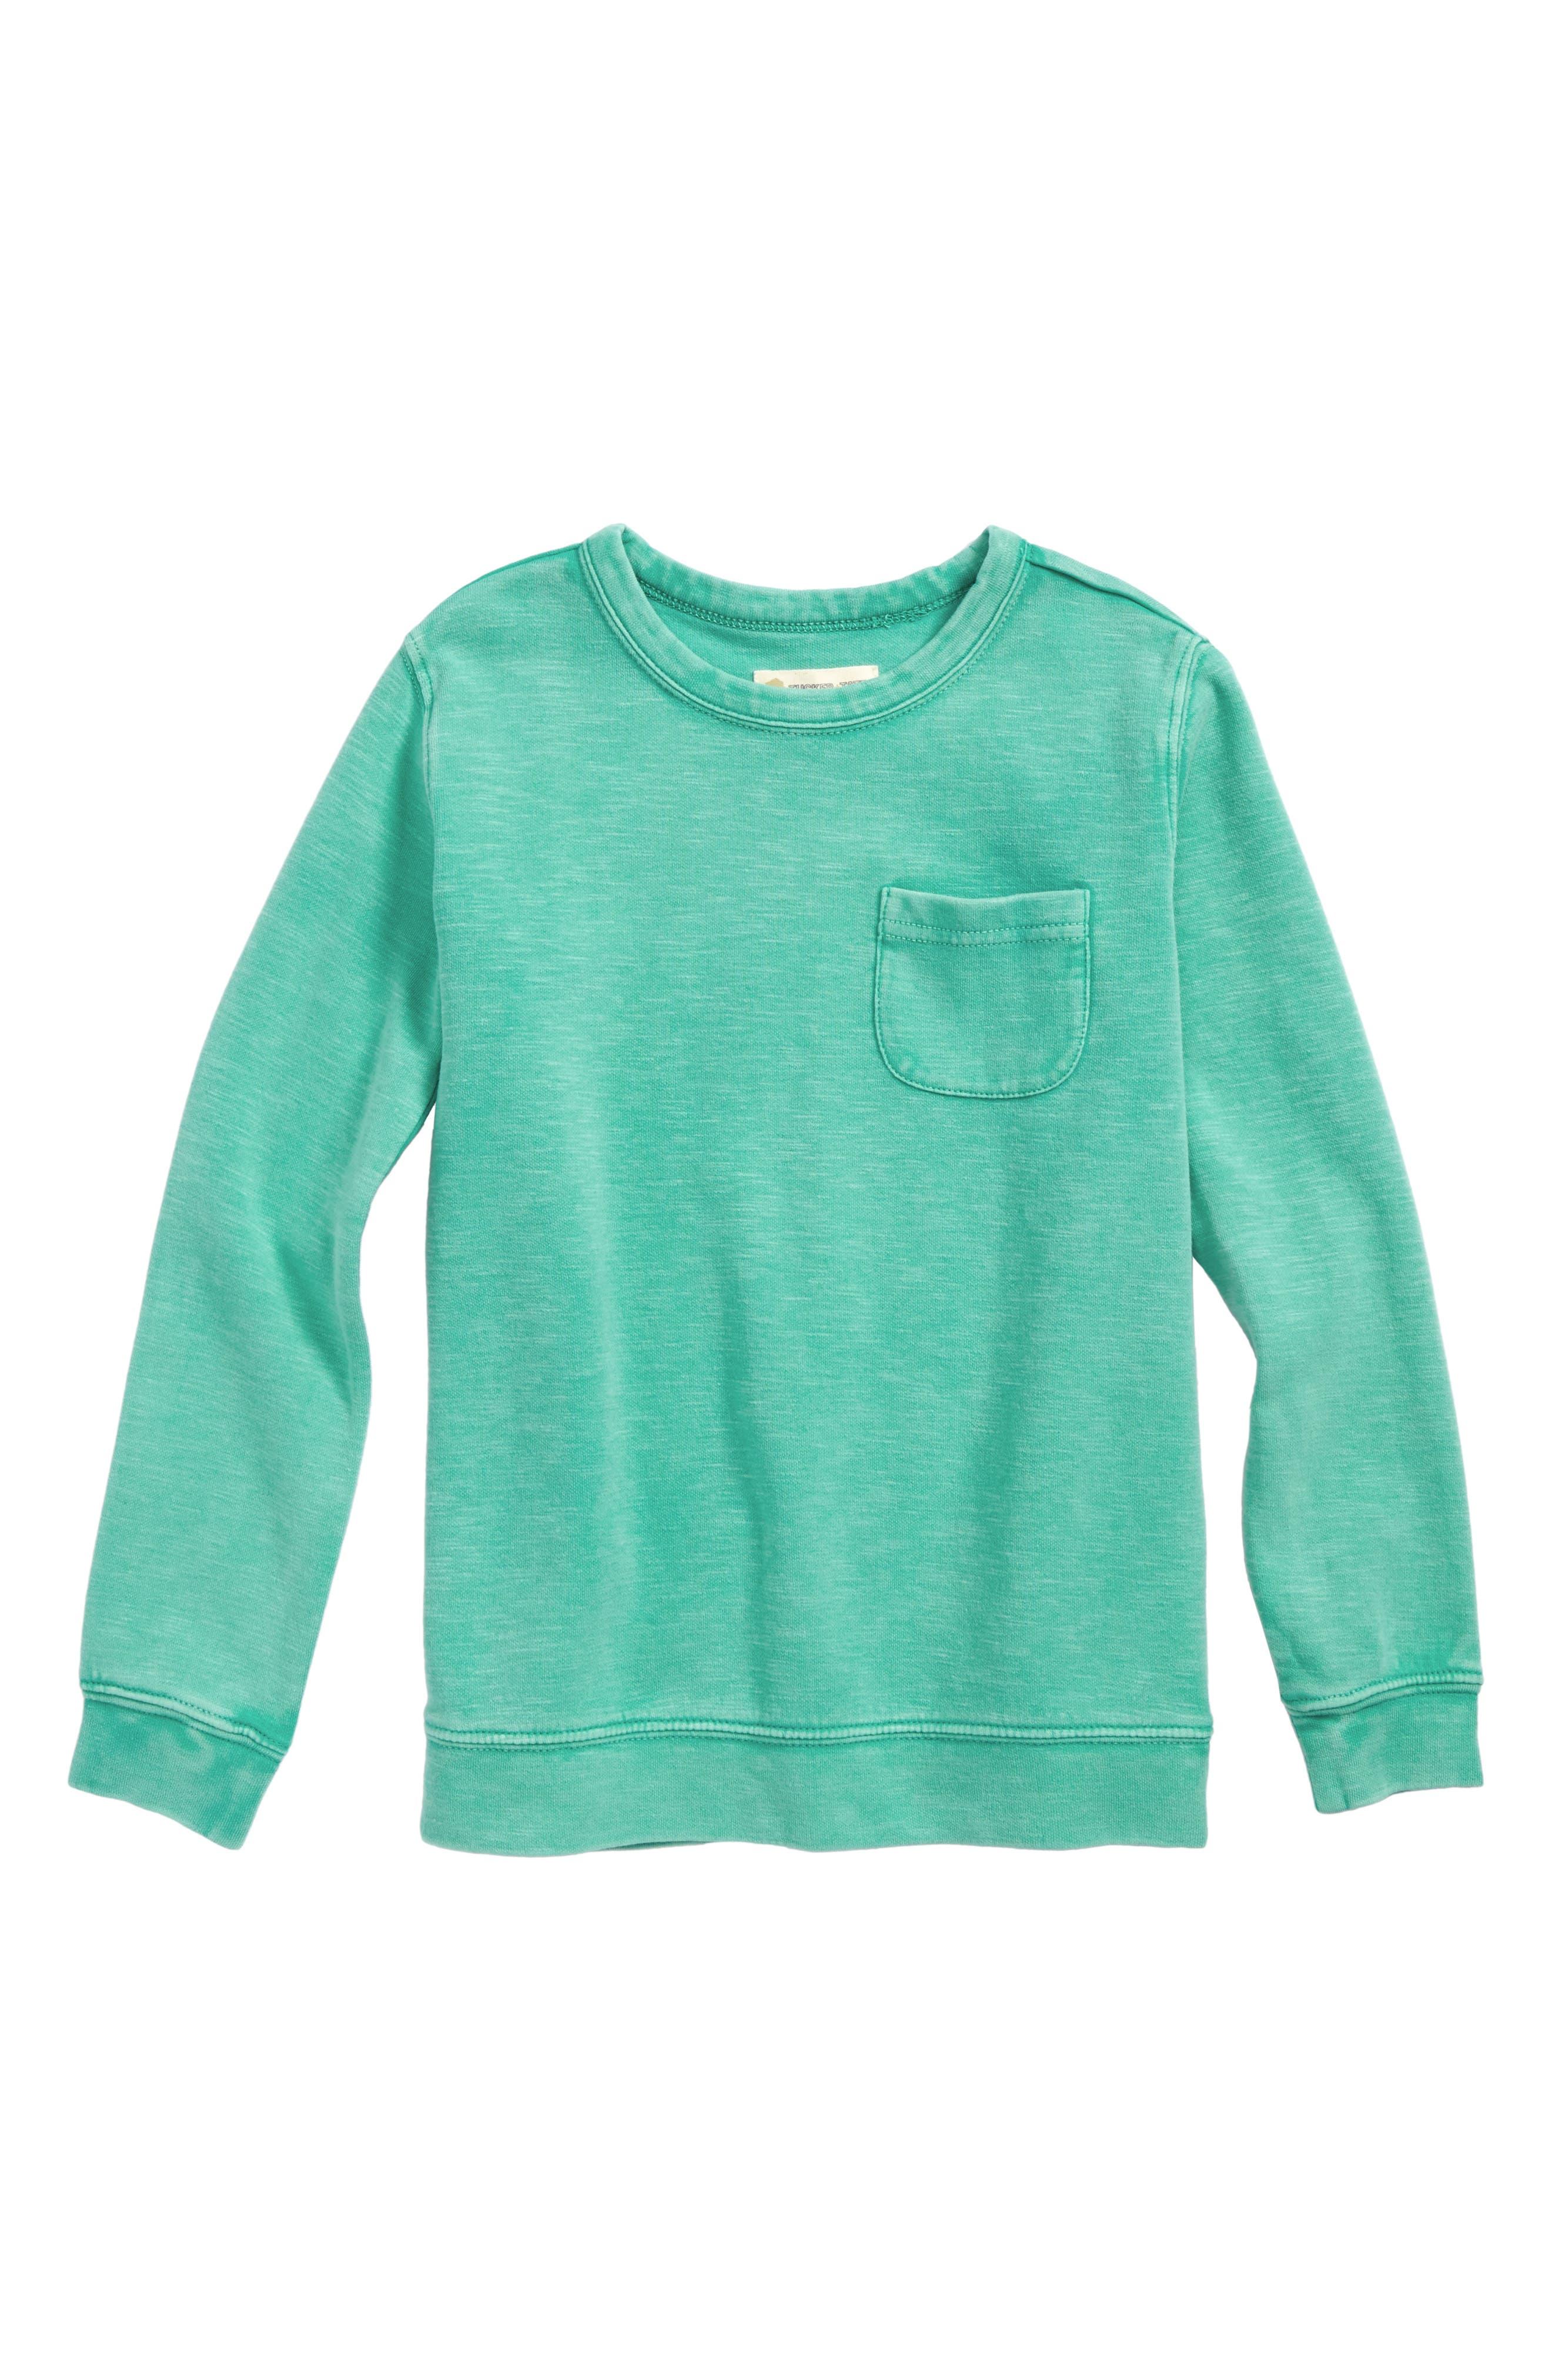 Interlock T-Shirt,                         Main,                         color, 301